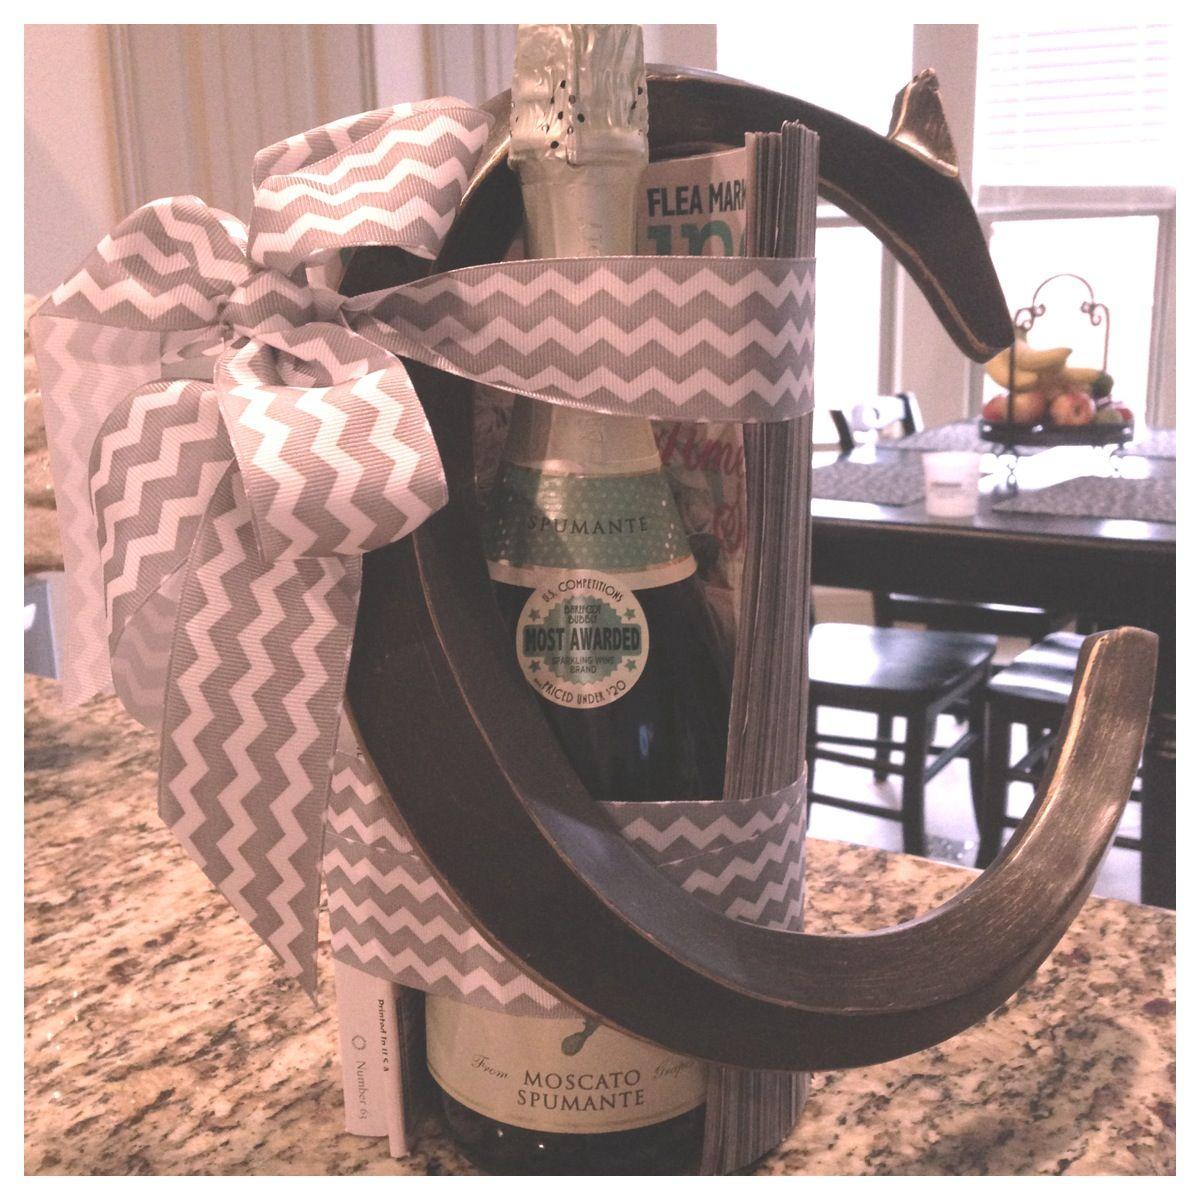 Engagement Gift Idea Bottle of wine or